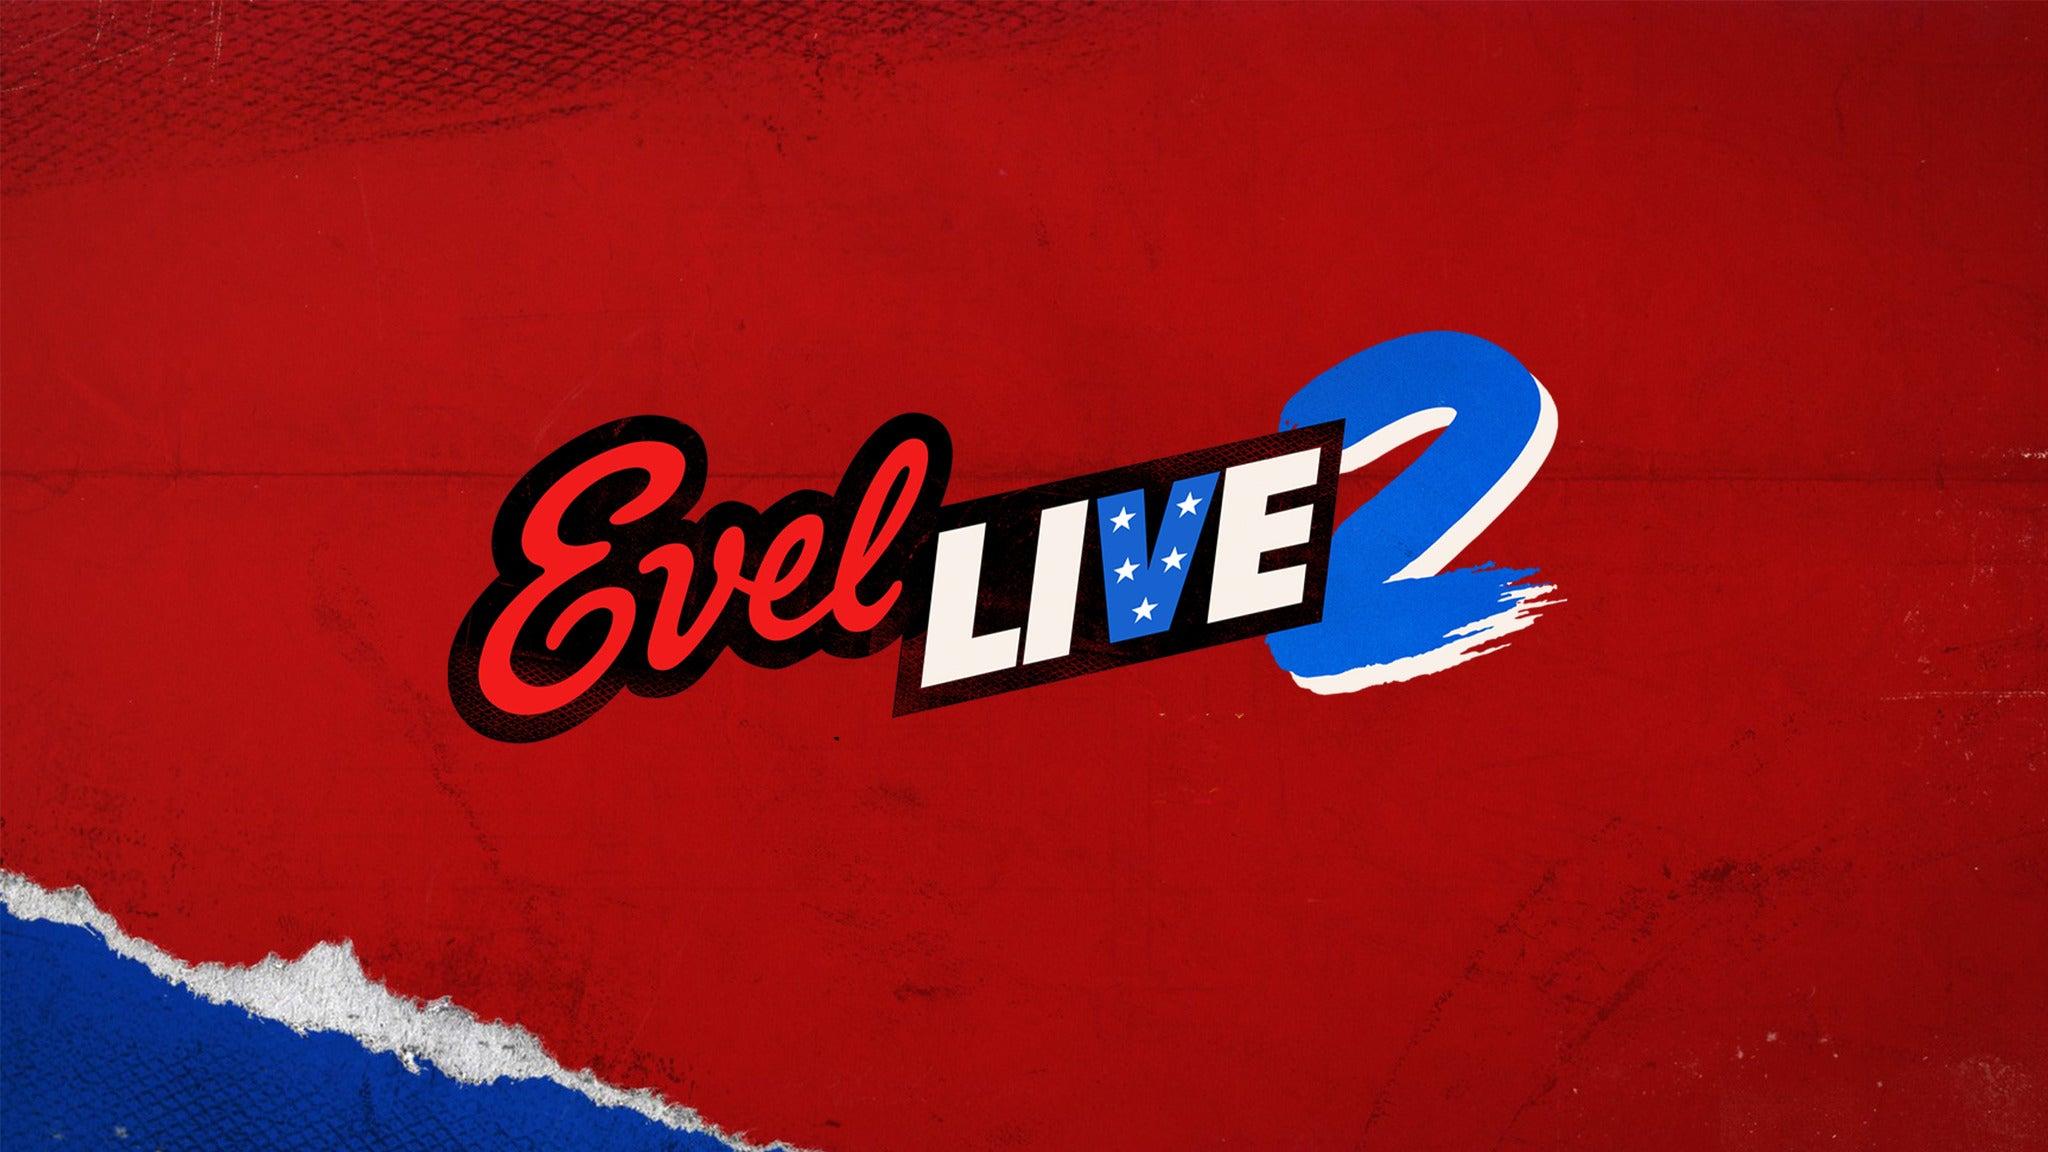 Evel Live 2 at San Bernardino International Airport